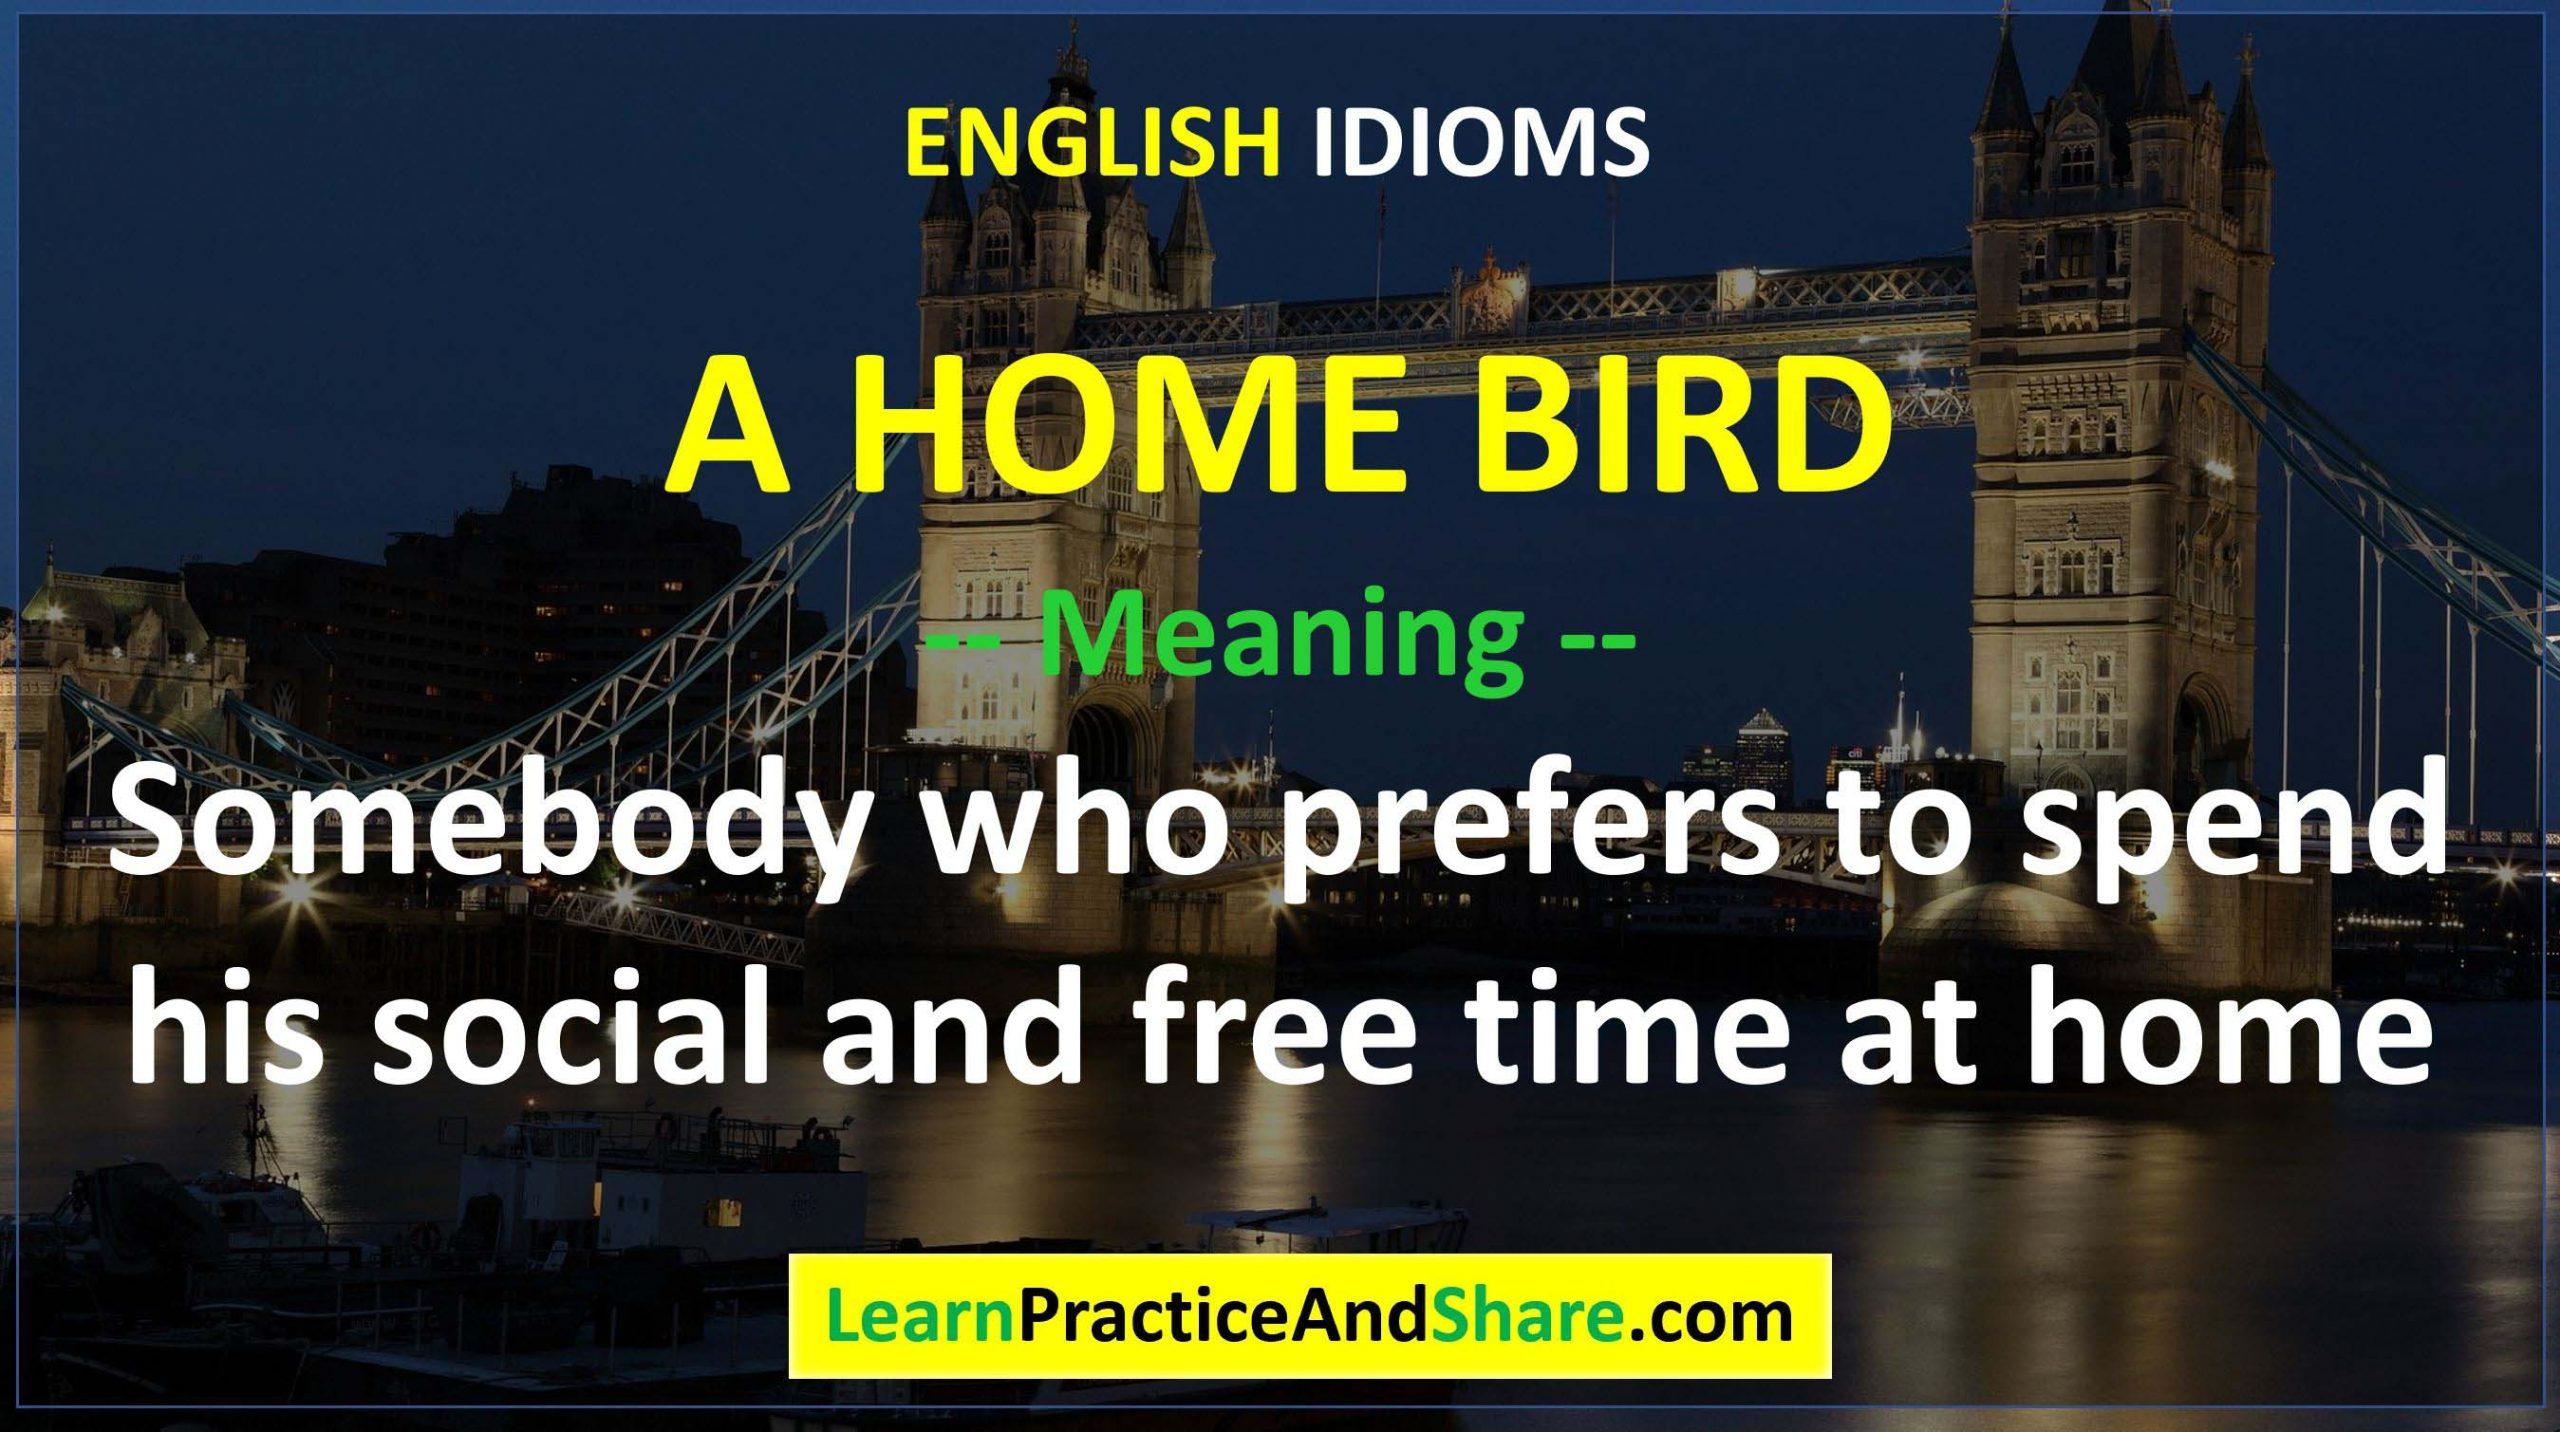 English Idiom - A Home Bird